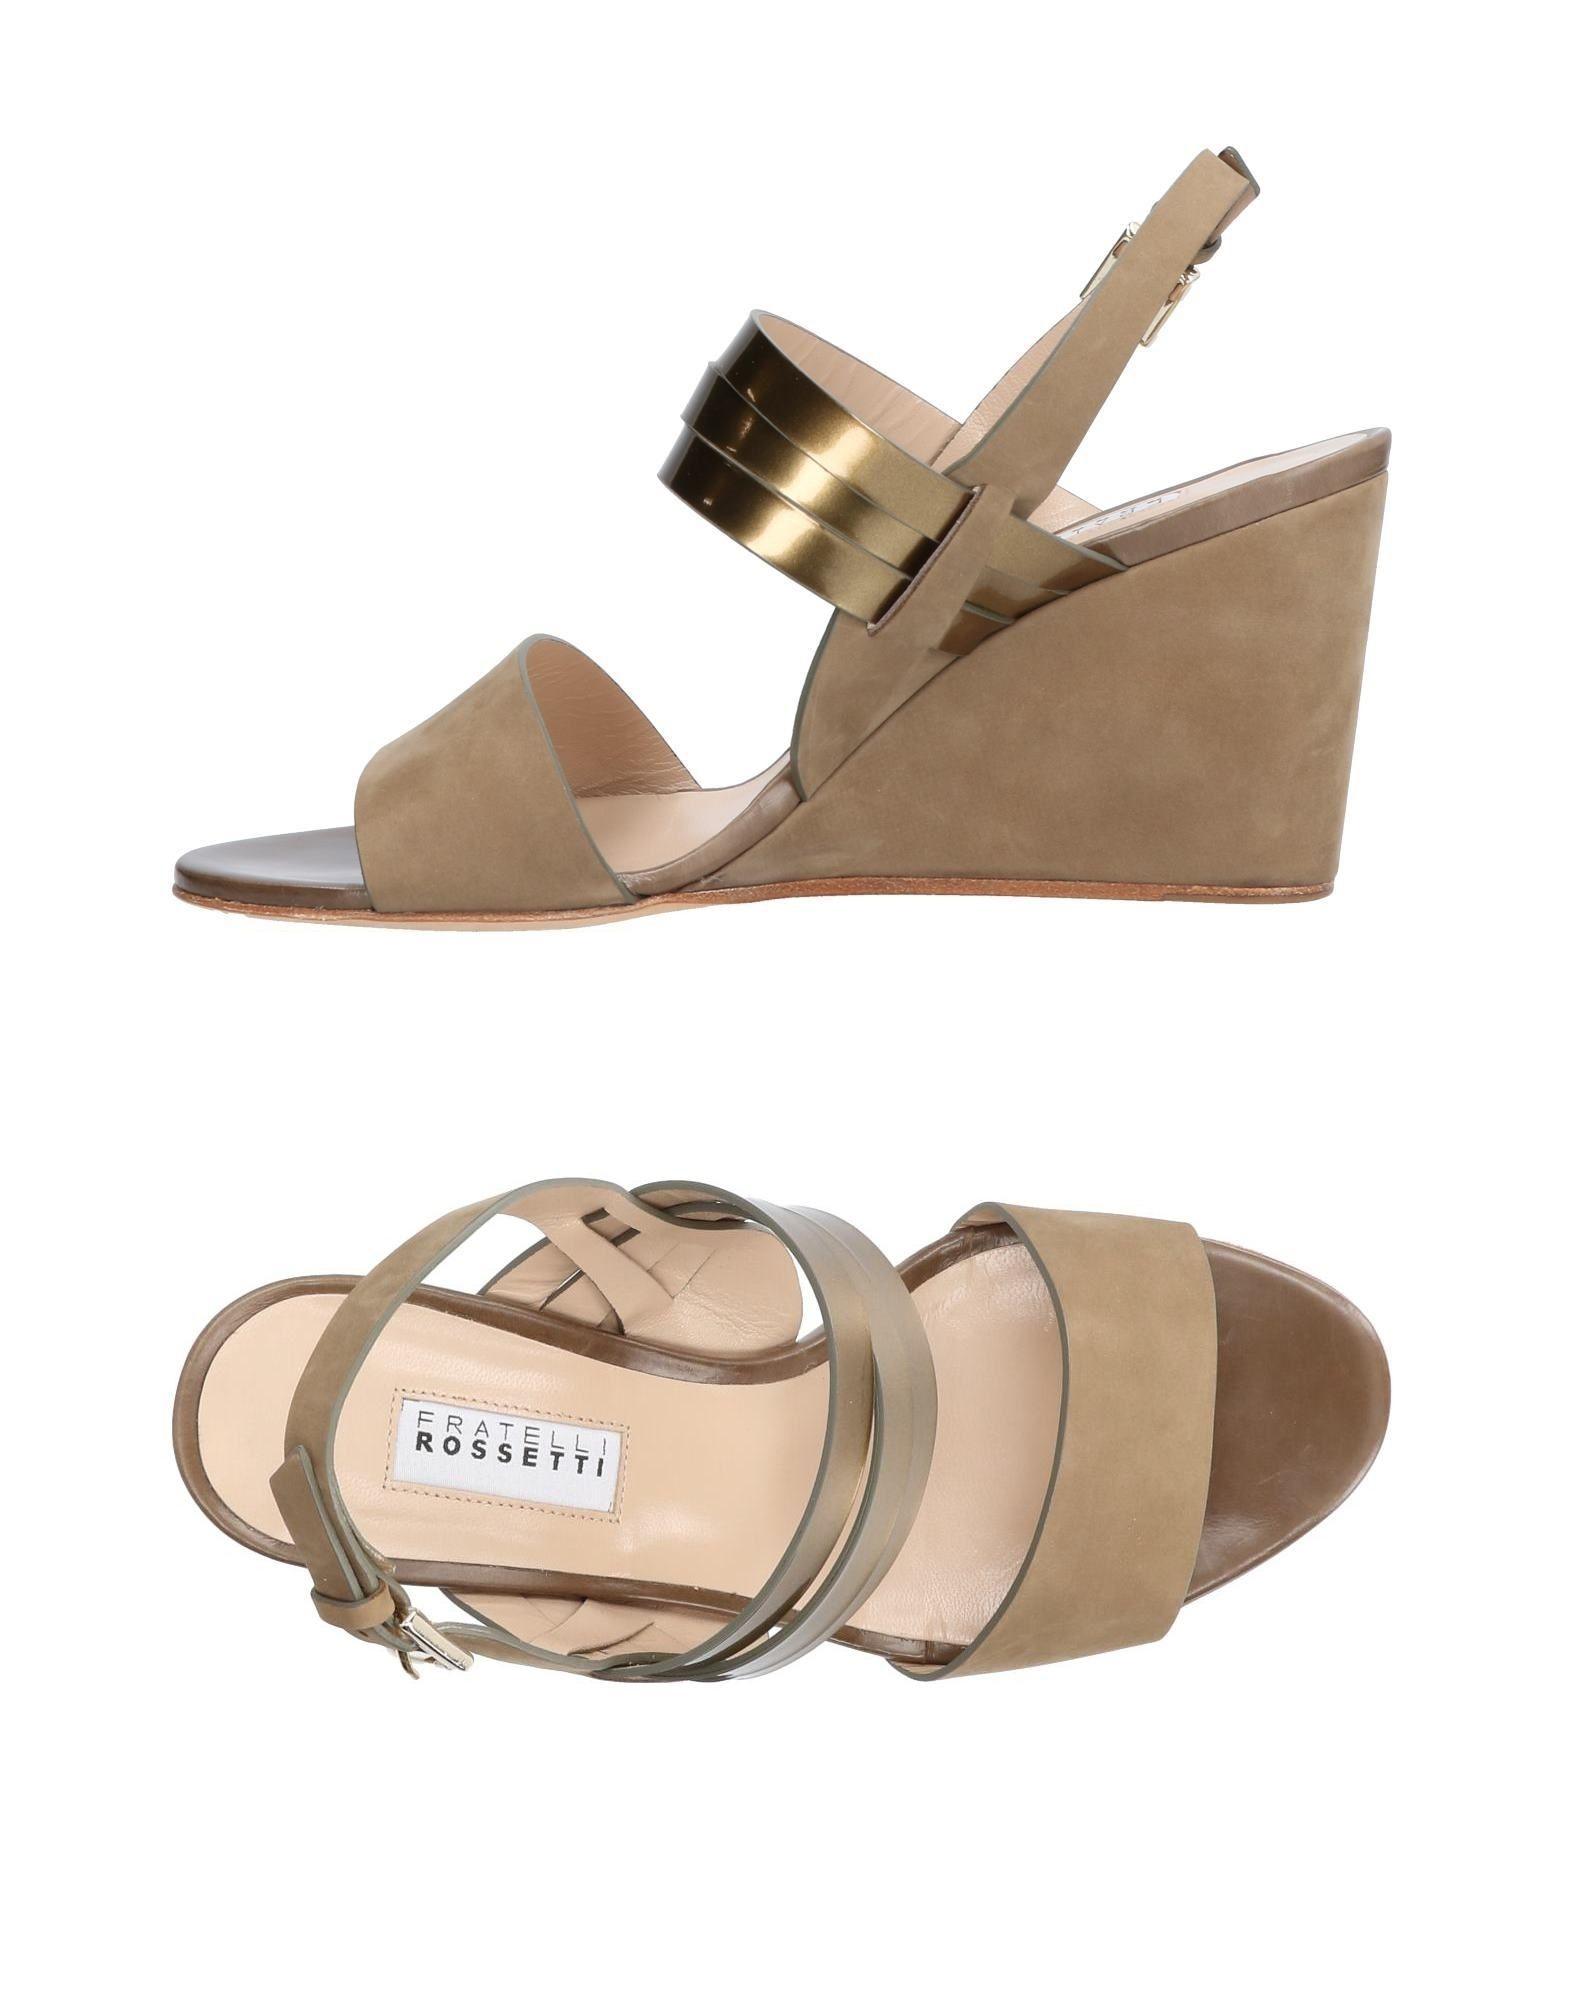 Fratelli Rossetti Sandalen Damen  11440668QRGut aussehende strapazierfähige Schuhe